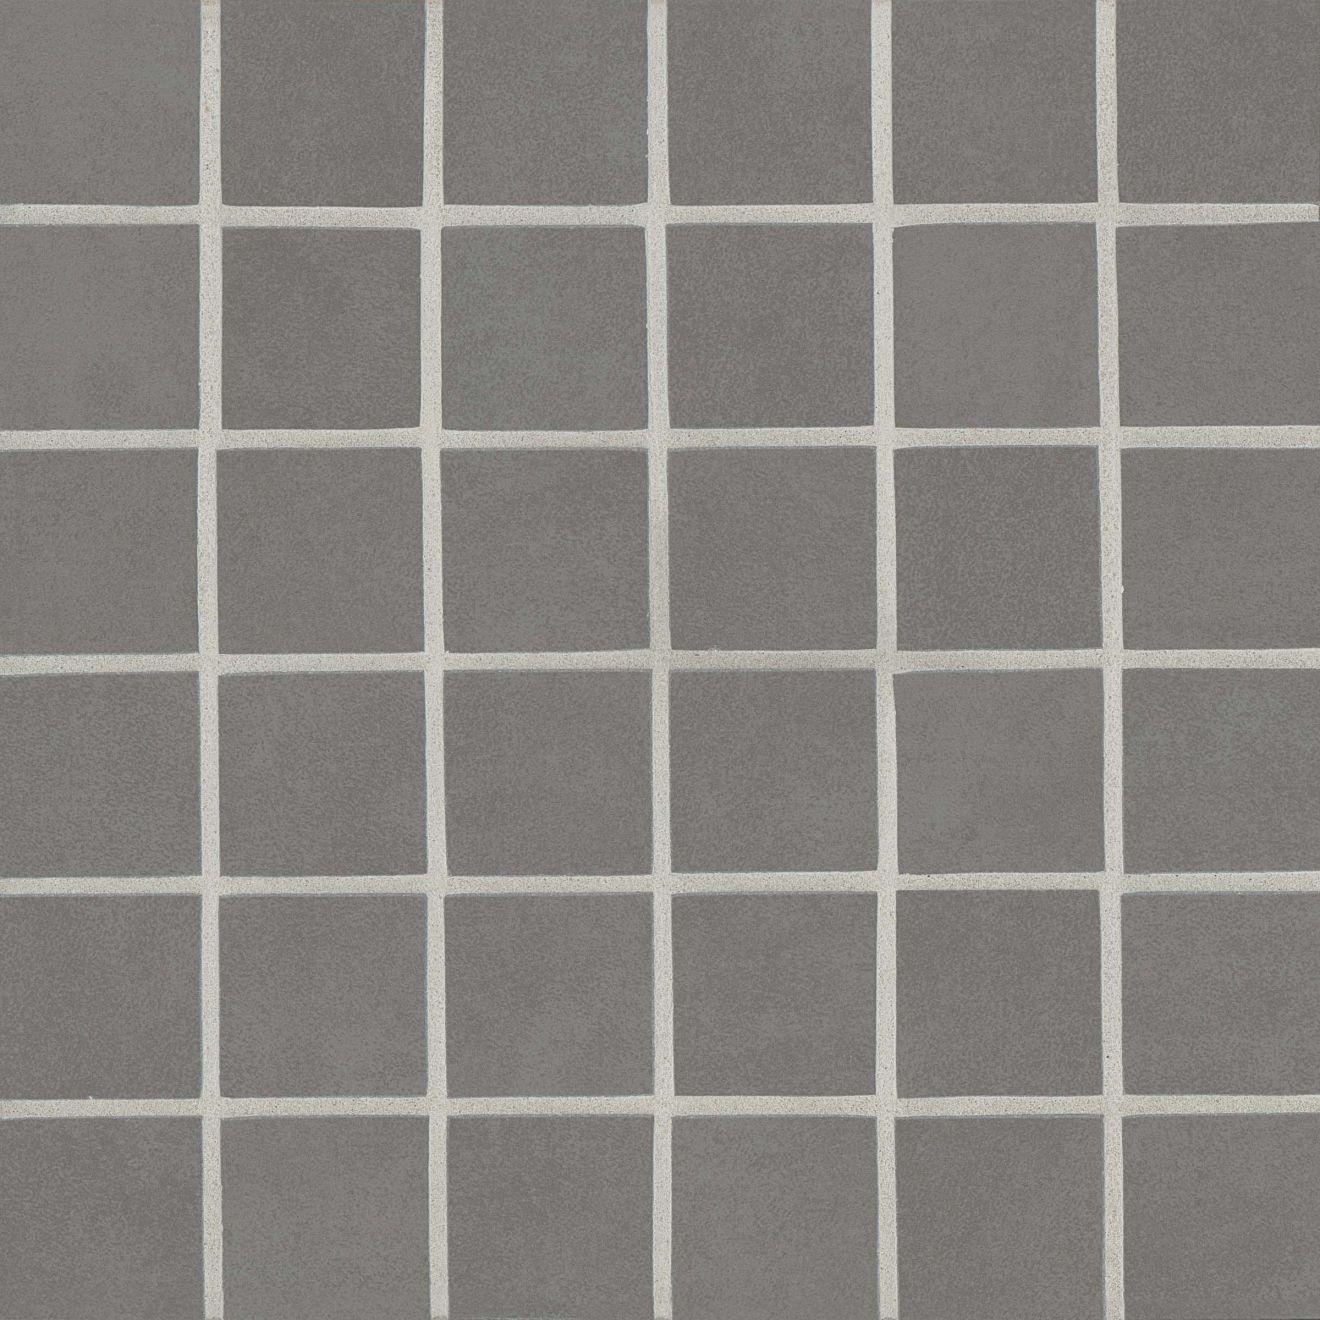 "Metro 2.0 2"" x 2"" Floor & Wall Mosaic in Nightsky"